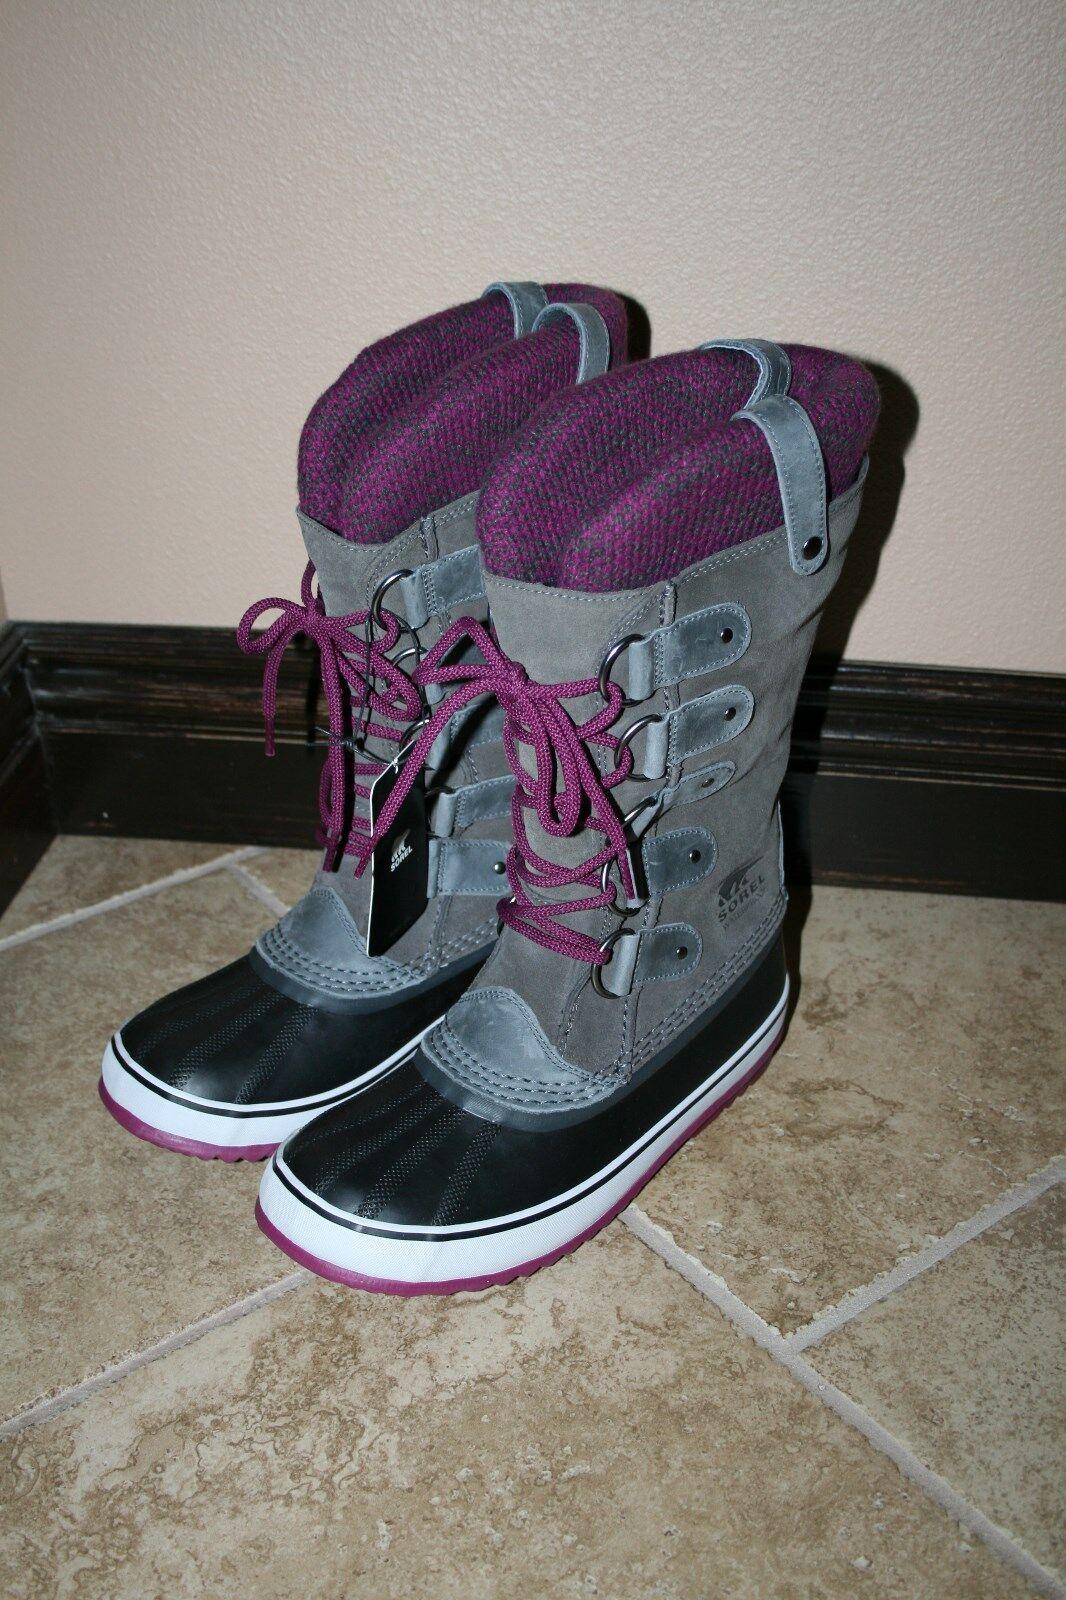 NIB New Sorel Joan of Arctic Knit Boots Shale Size 9